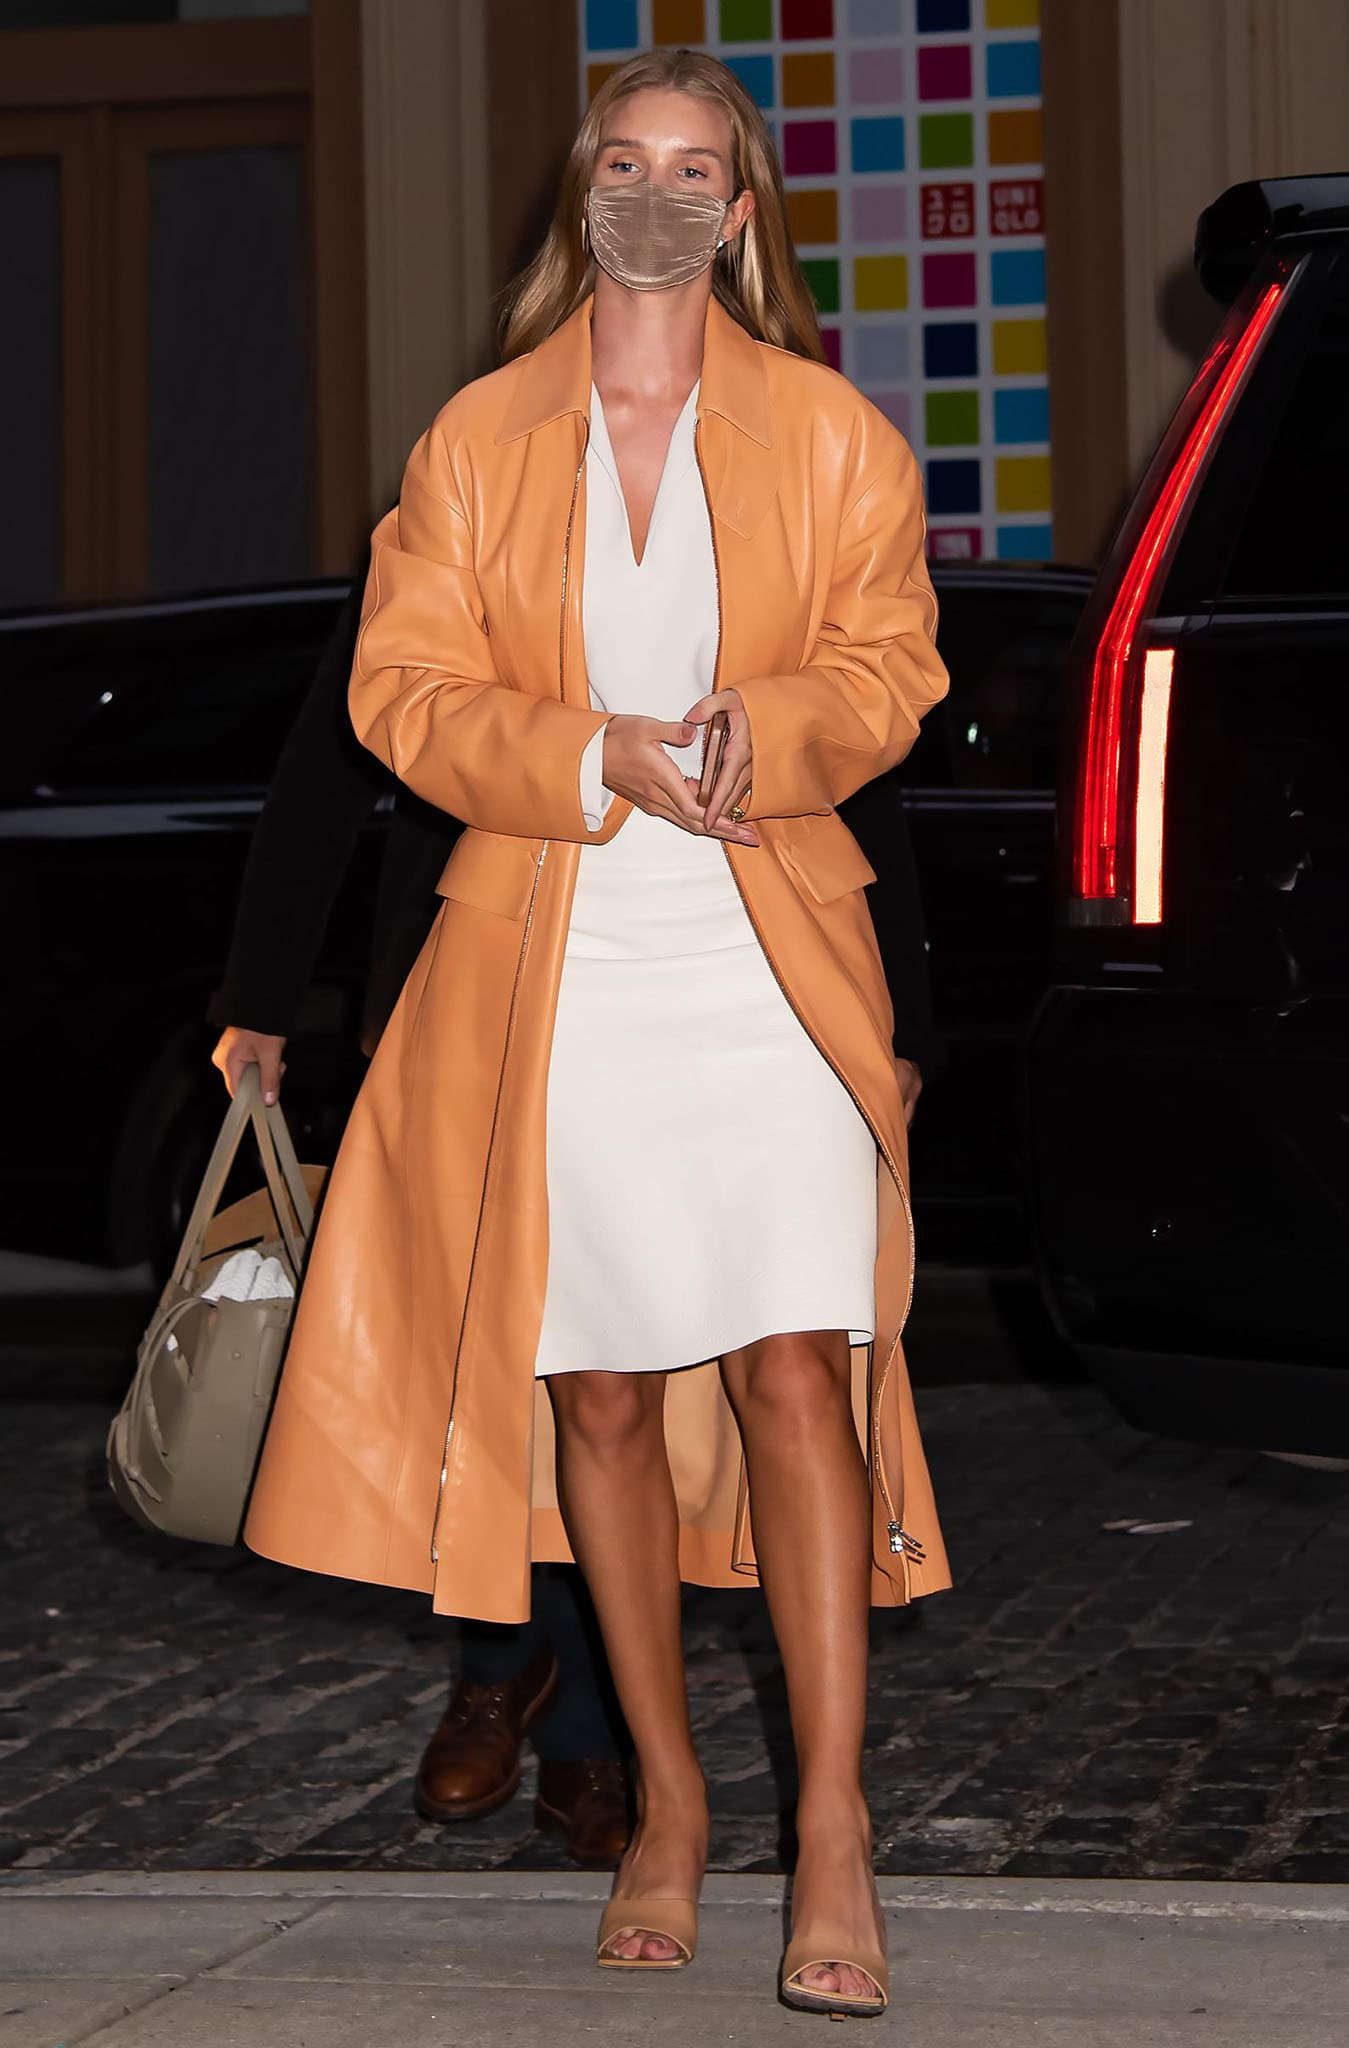 Rosie Huntington-Whiteley shows spring-chic in Bottega Veneta coral orange trench coat, Toteme cream blouse, and Bottega Veneta leather skirt